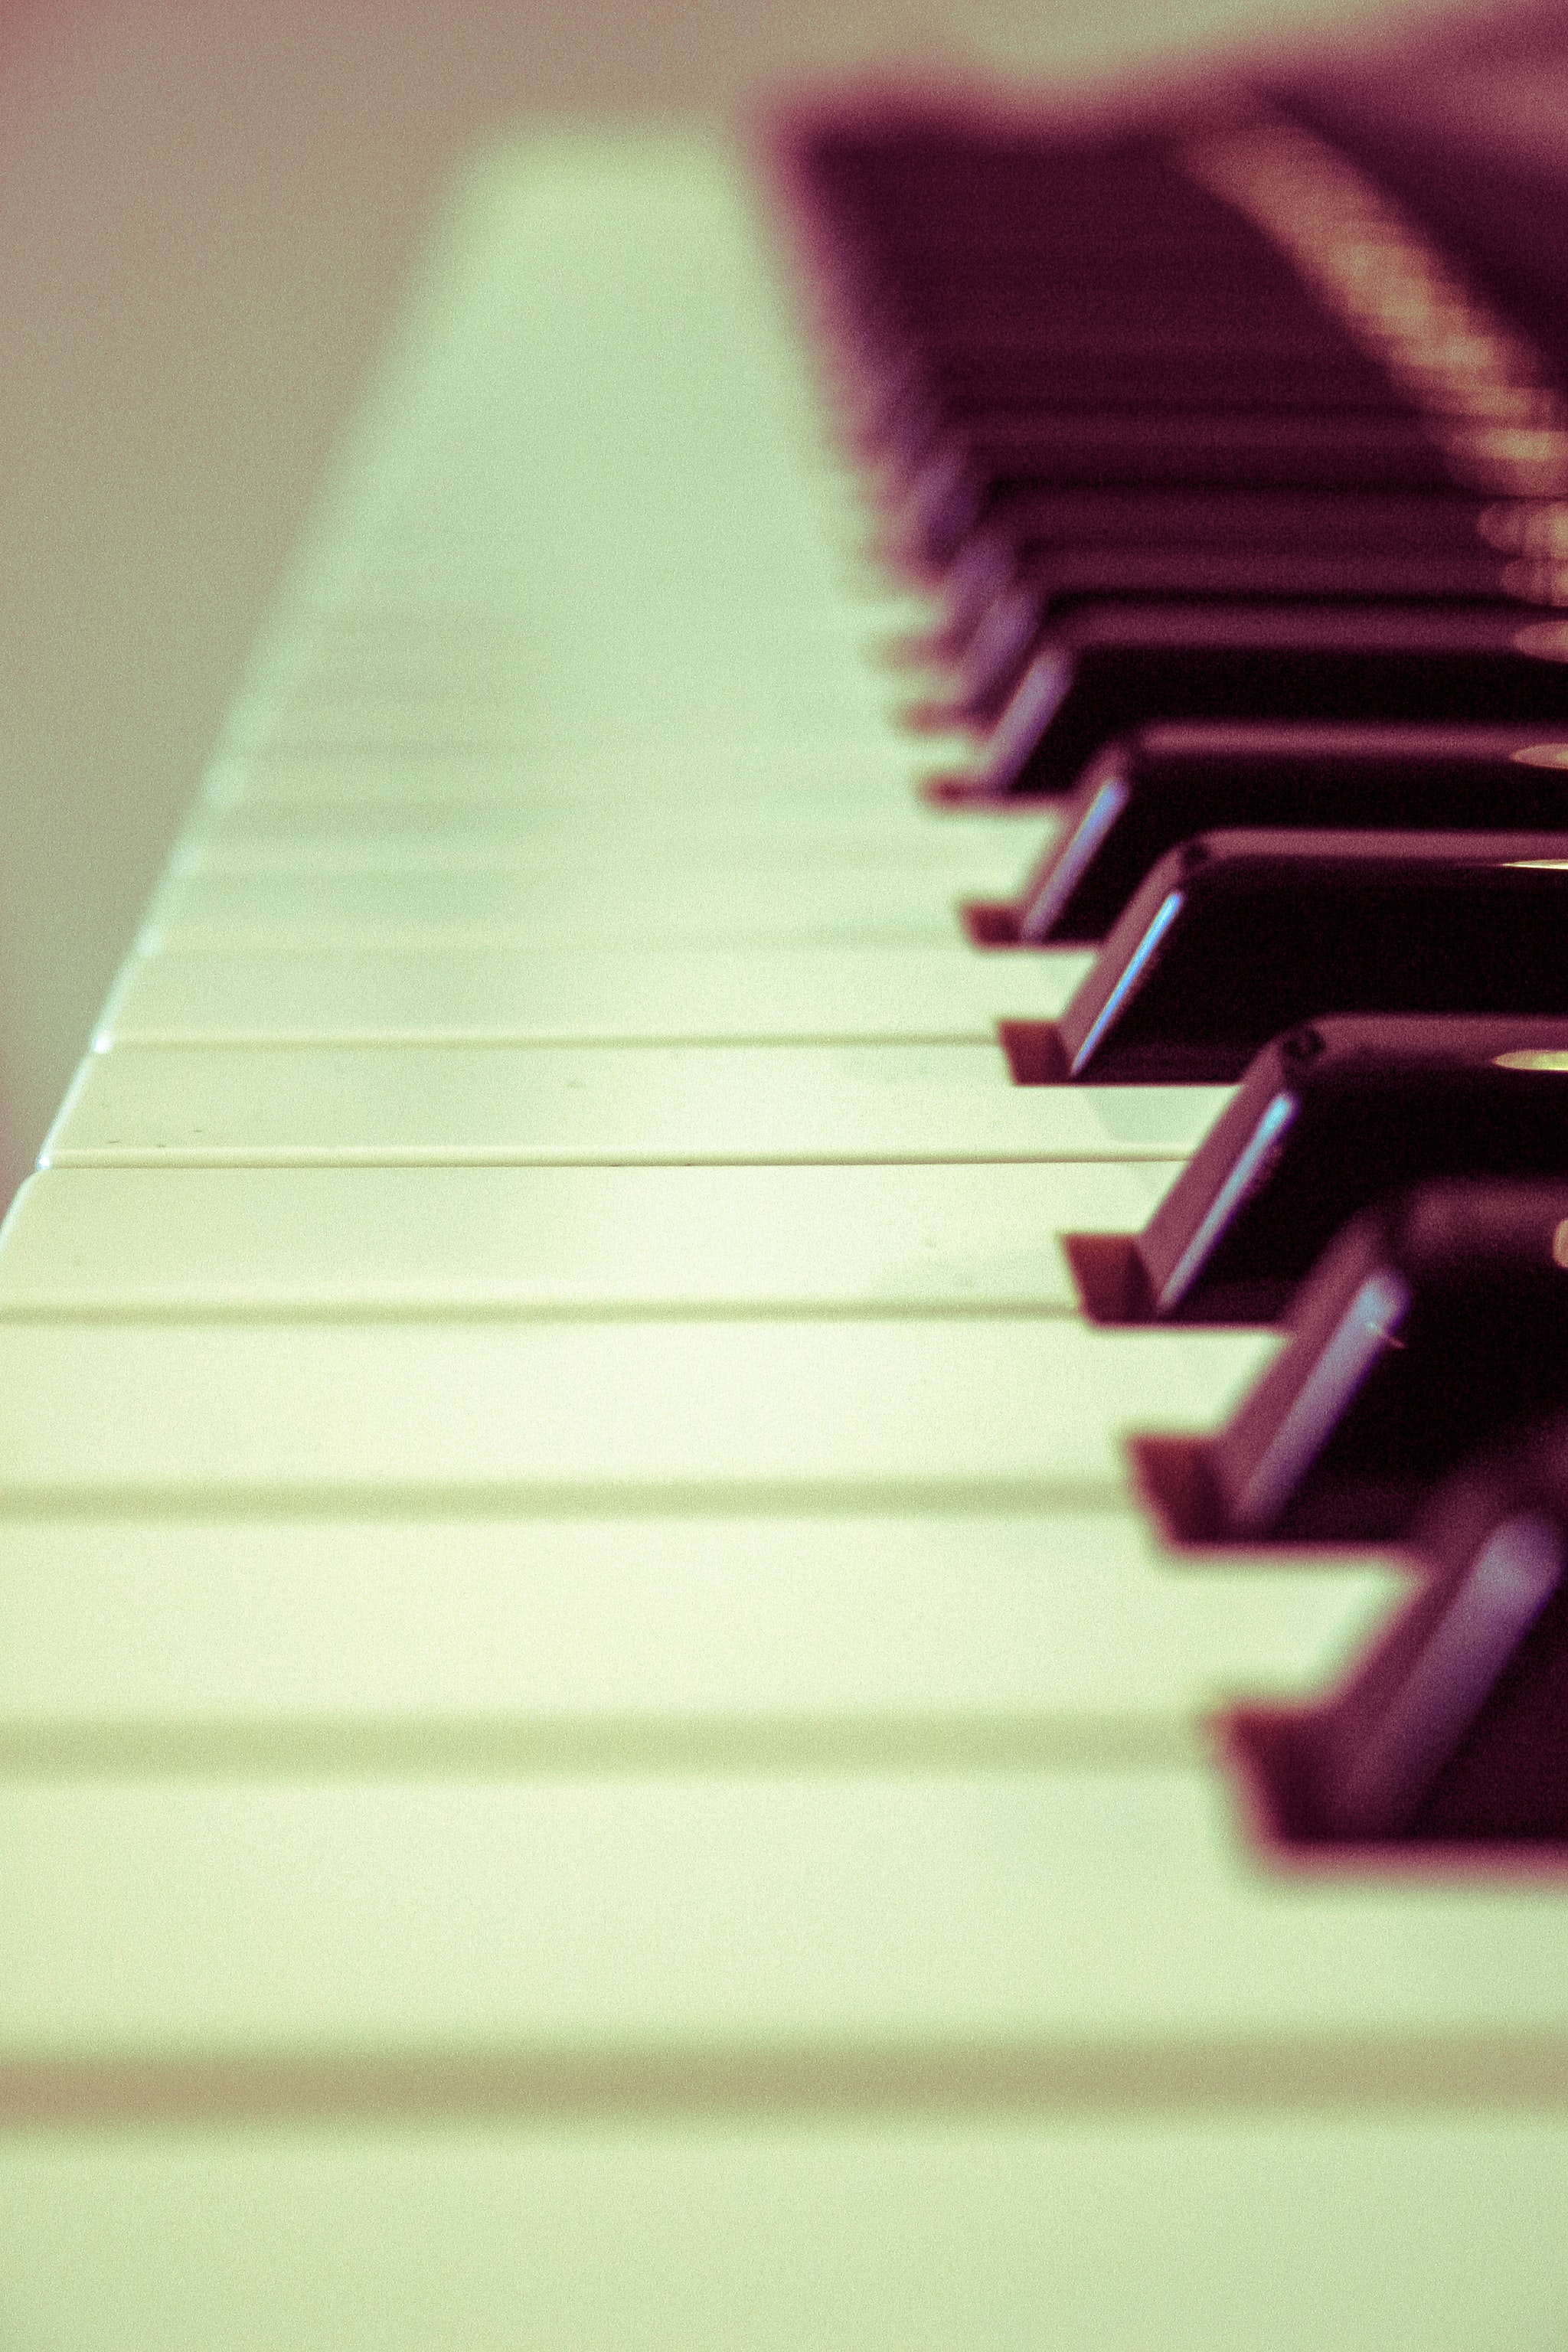 Black Electronic Keyboard 183 Free Stock Photo